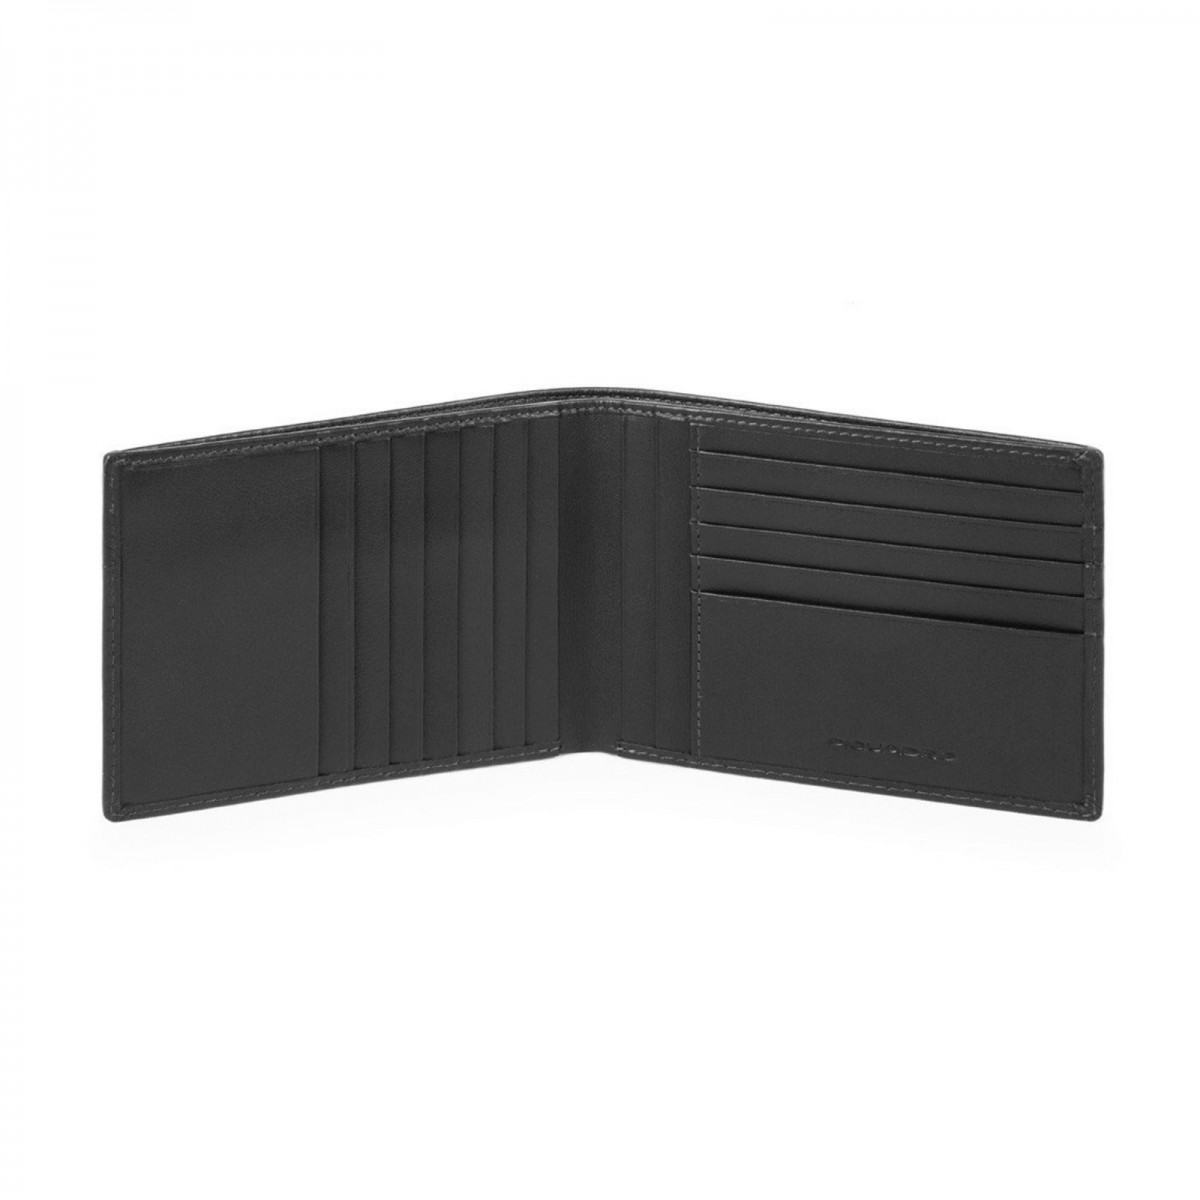 PIQUADRO Urban portafogli uomo 12 cc, RFID, pelle nero